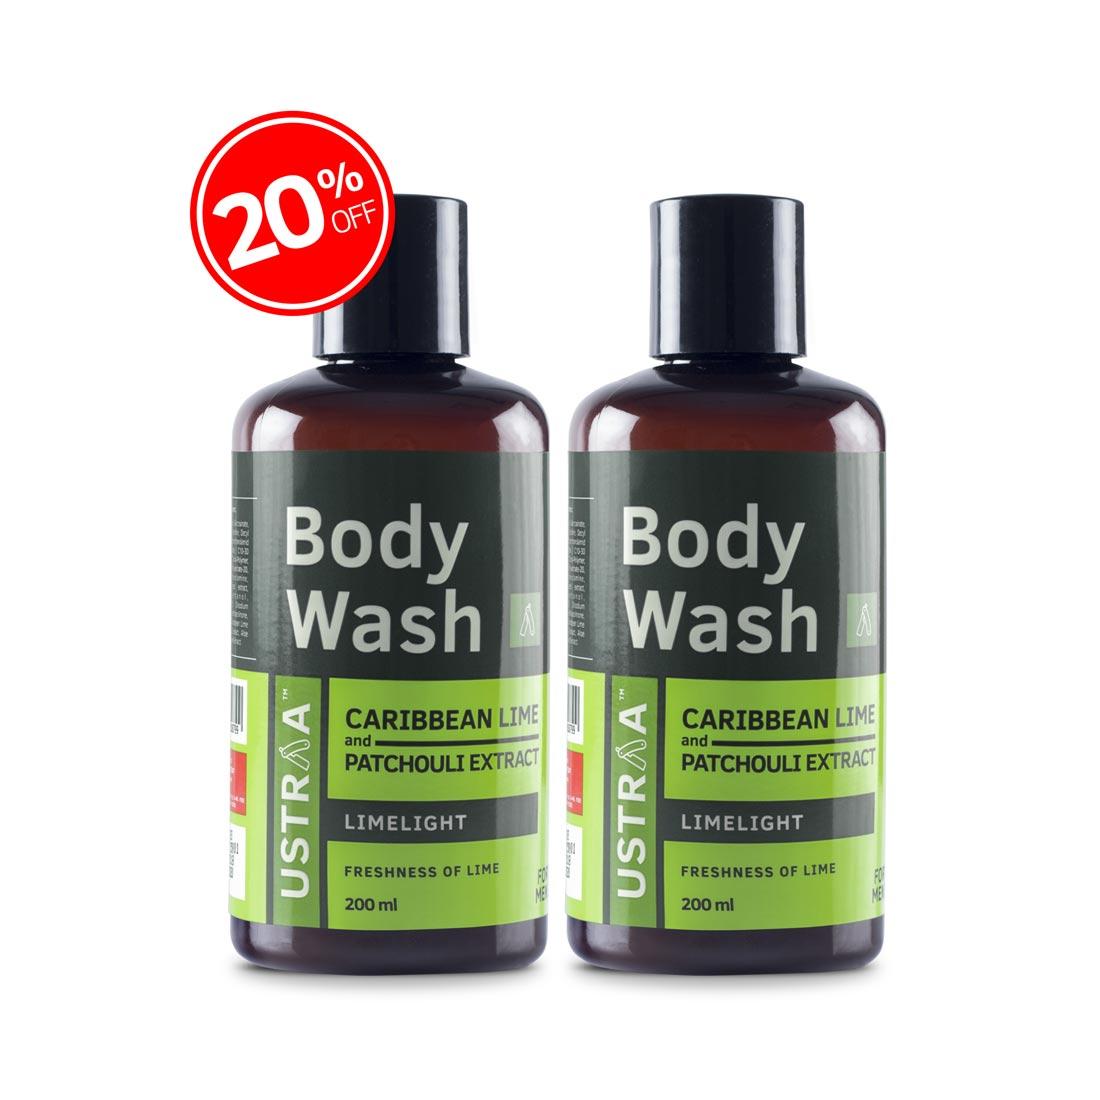 Body Wash - Limelight - 200ml - Set of 2